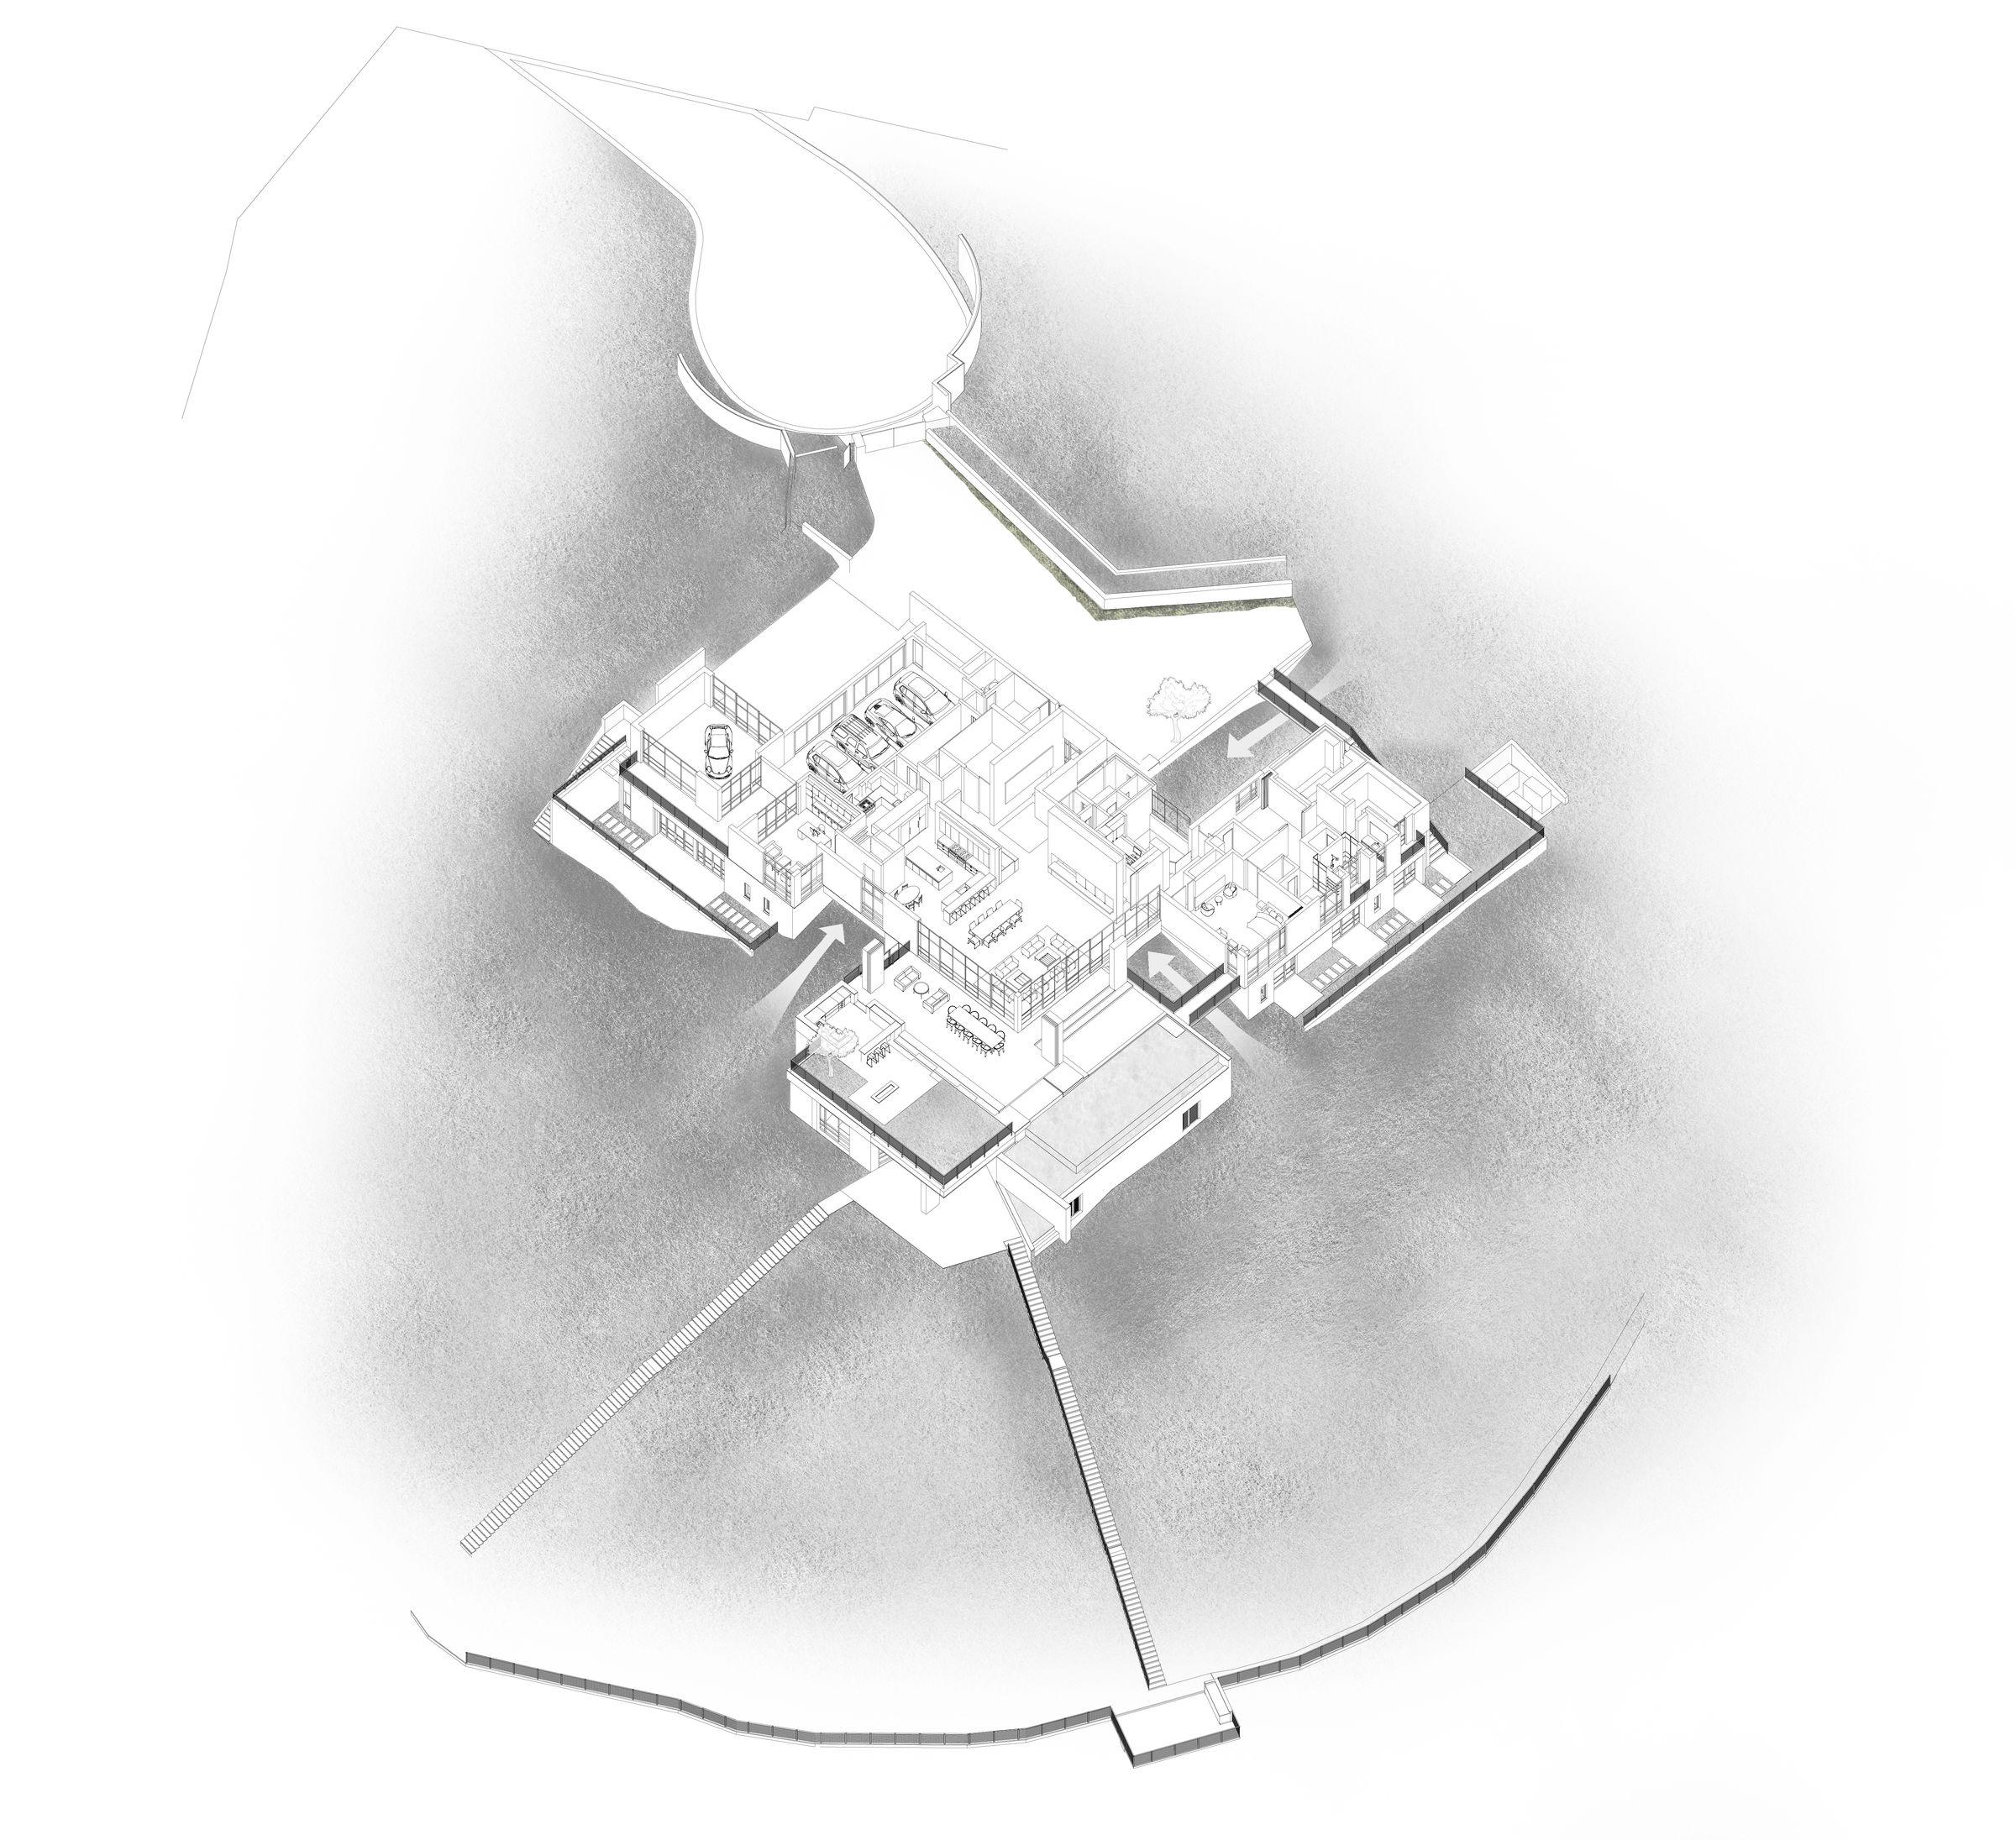 SA14 Presentation_Axo Diagram_No Roof-01.jpg